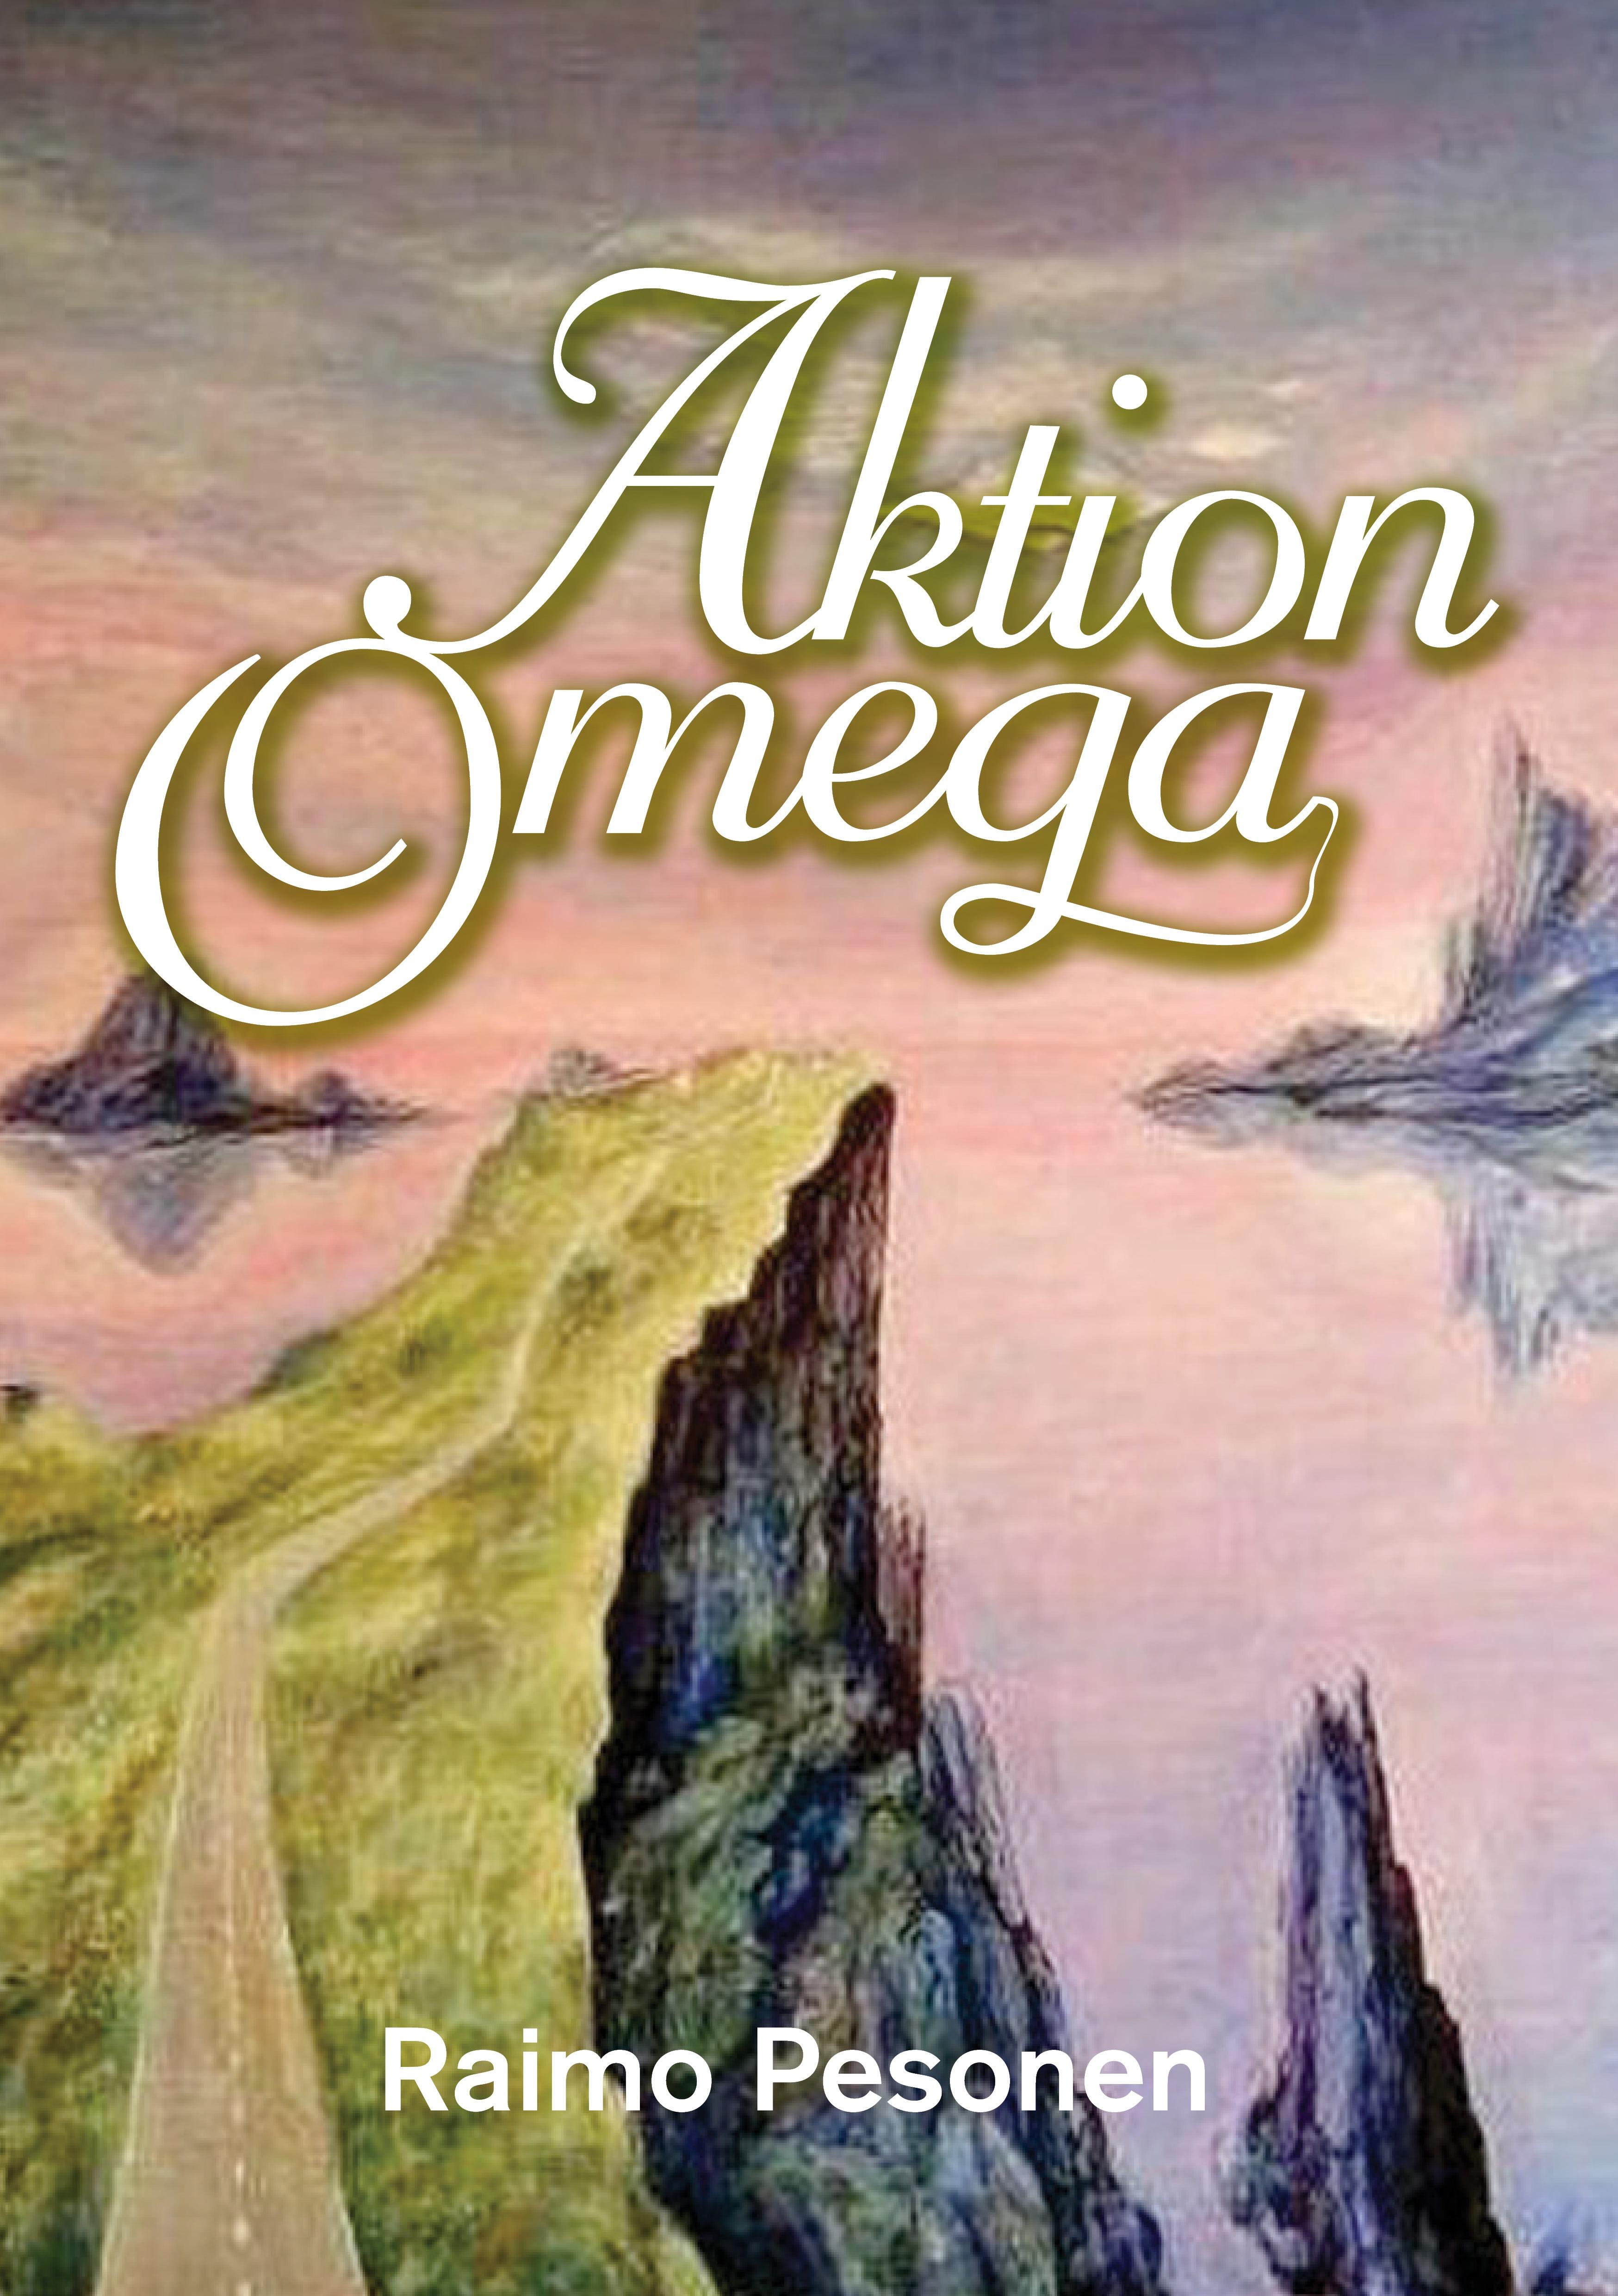 Aktion Omega